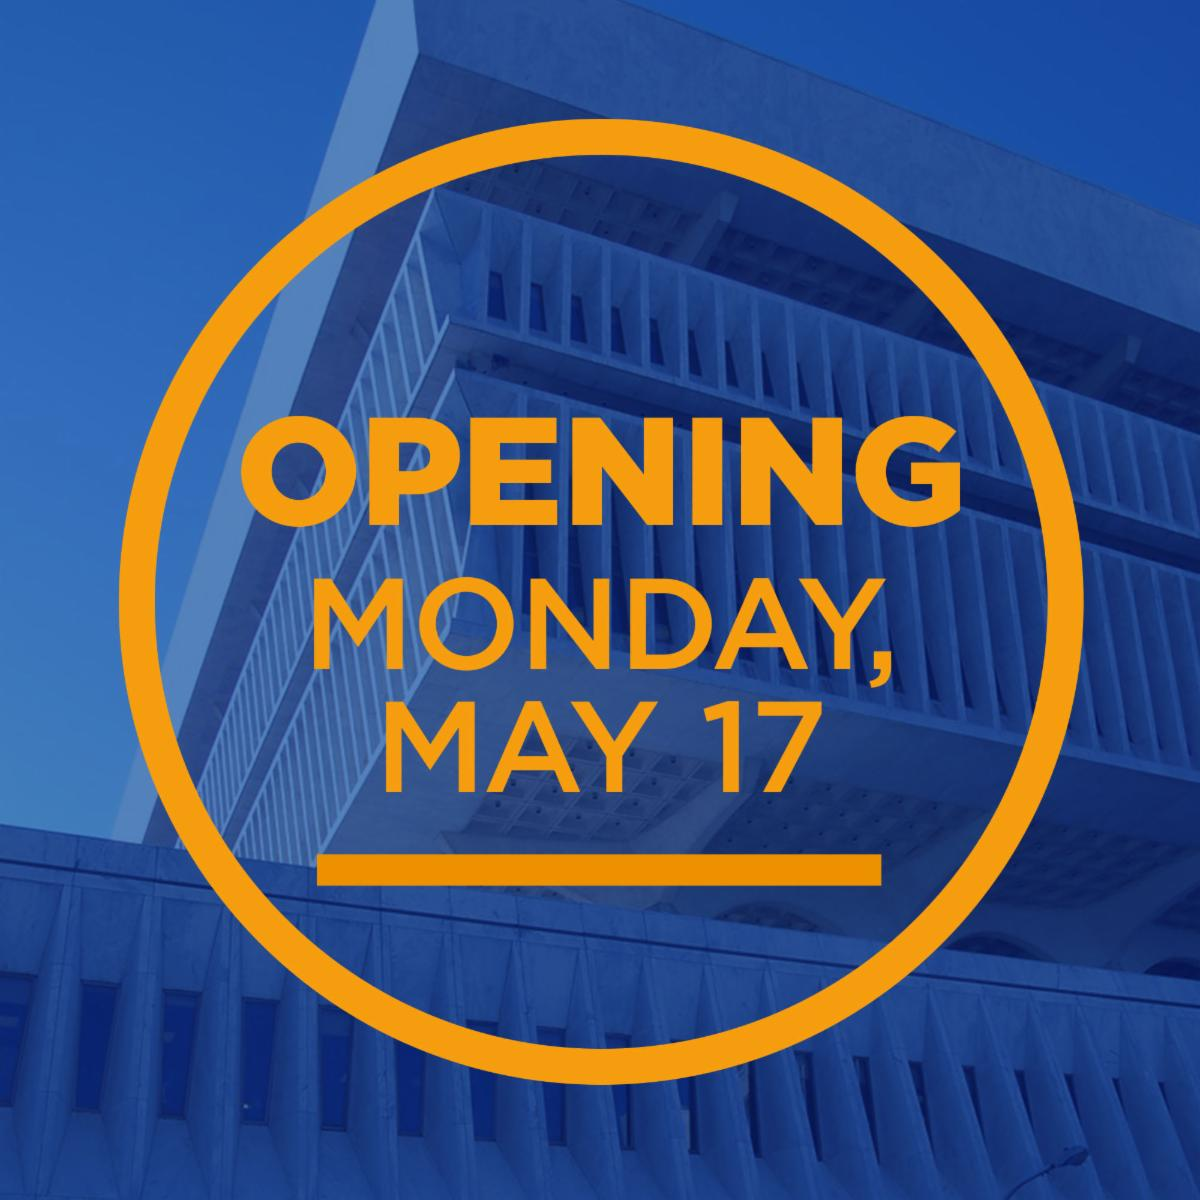 Opening Monday, May 17